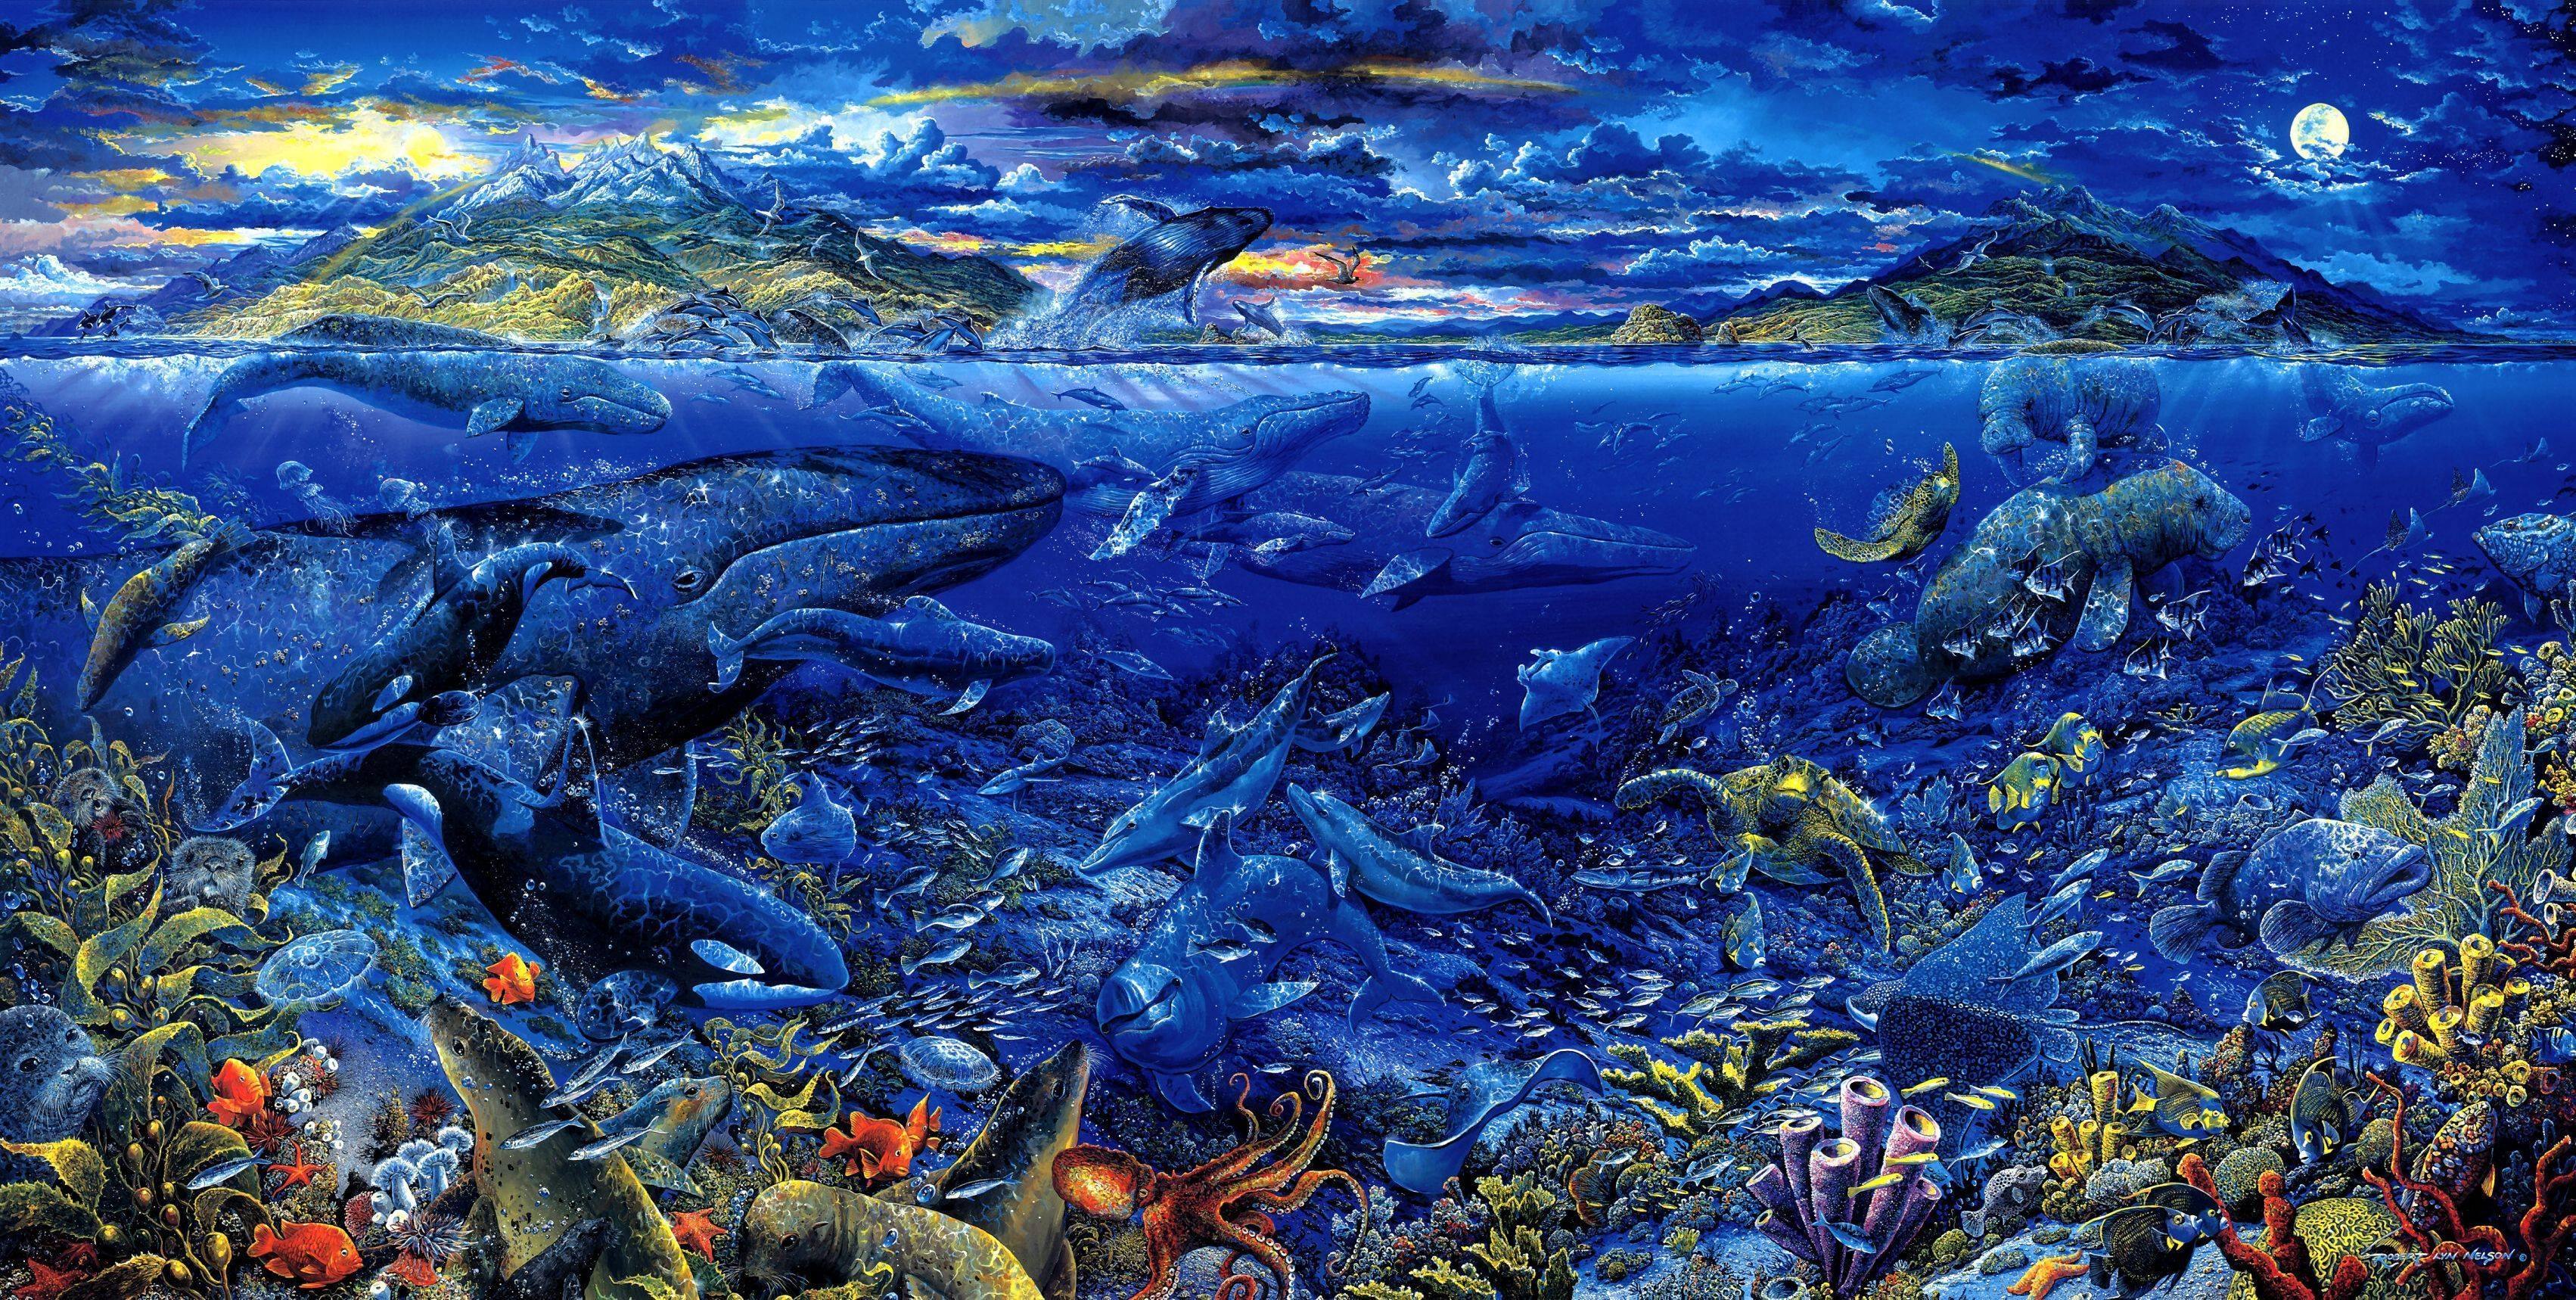 Animal   Sea Life Artistic Whale Fish Ocean Sea Fantasy Wallpaper 3405x1718